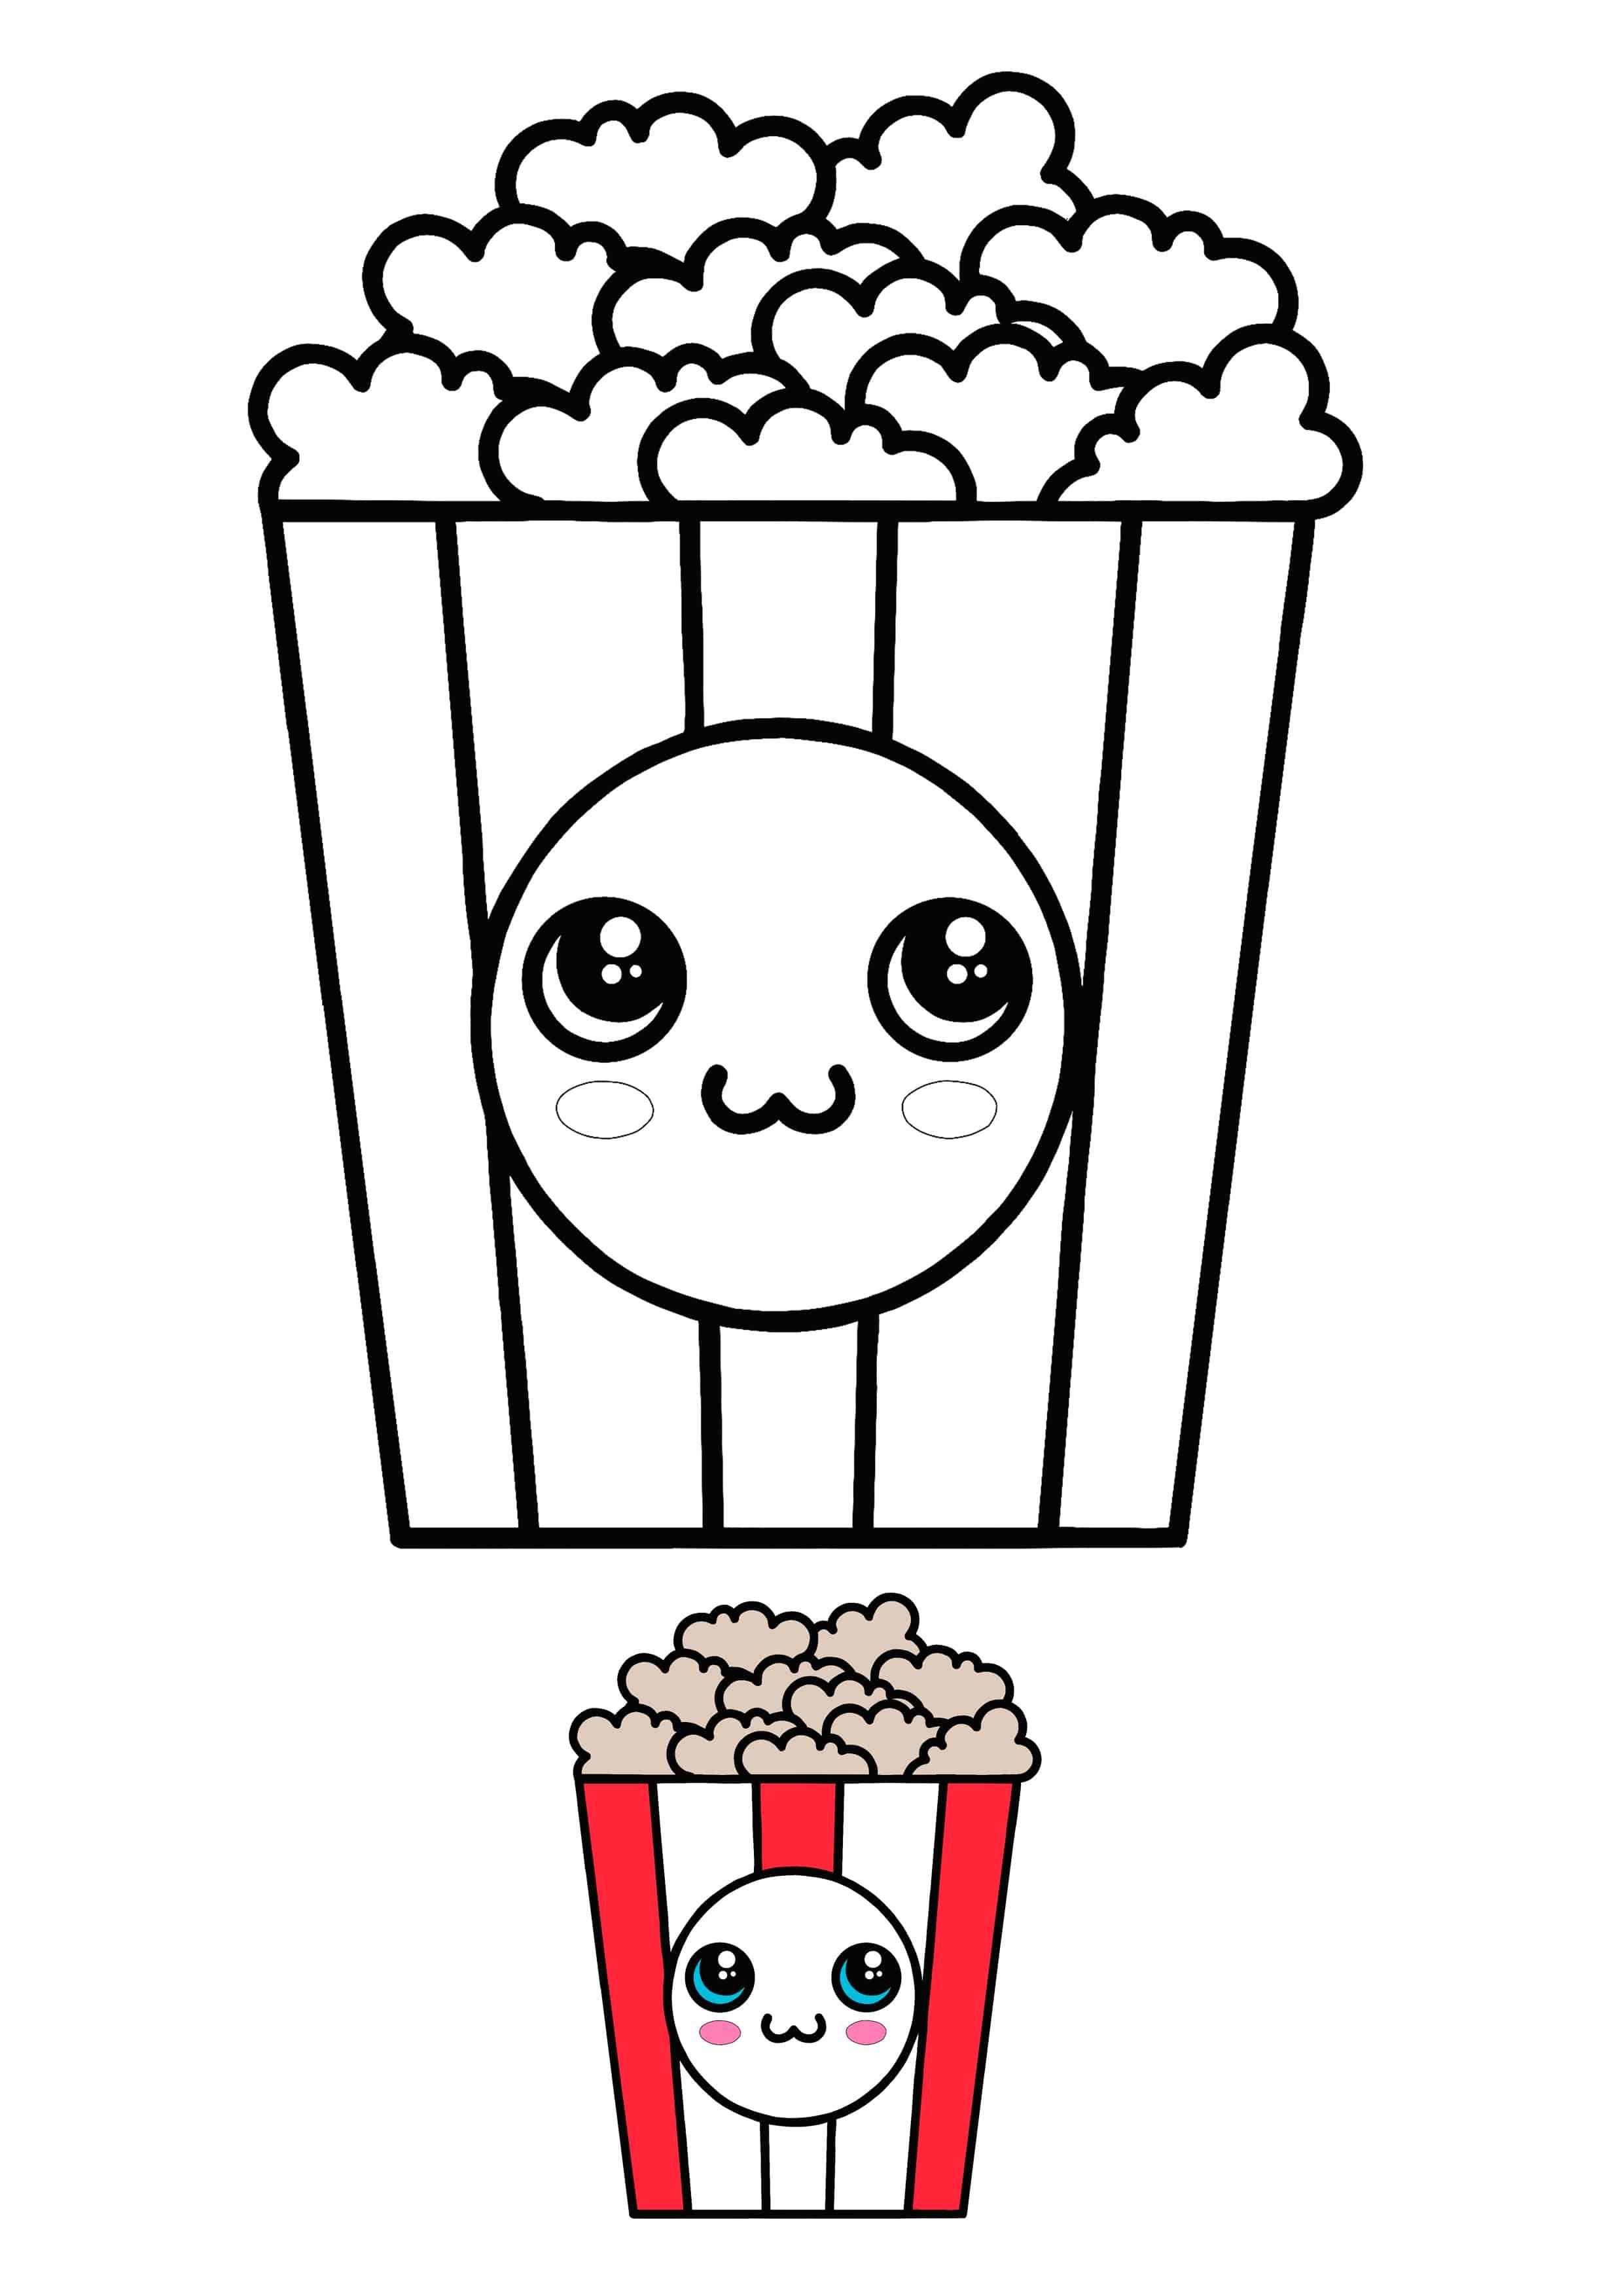 Kawaii Popcorn Coloring Sheet Coloring Pages Colored Popcorn Free Printable Coloring